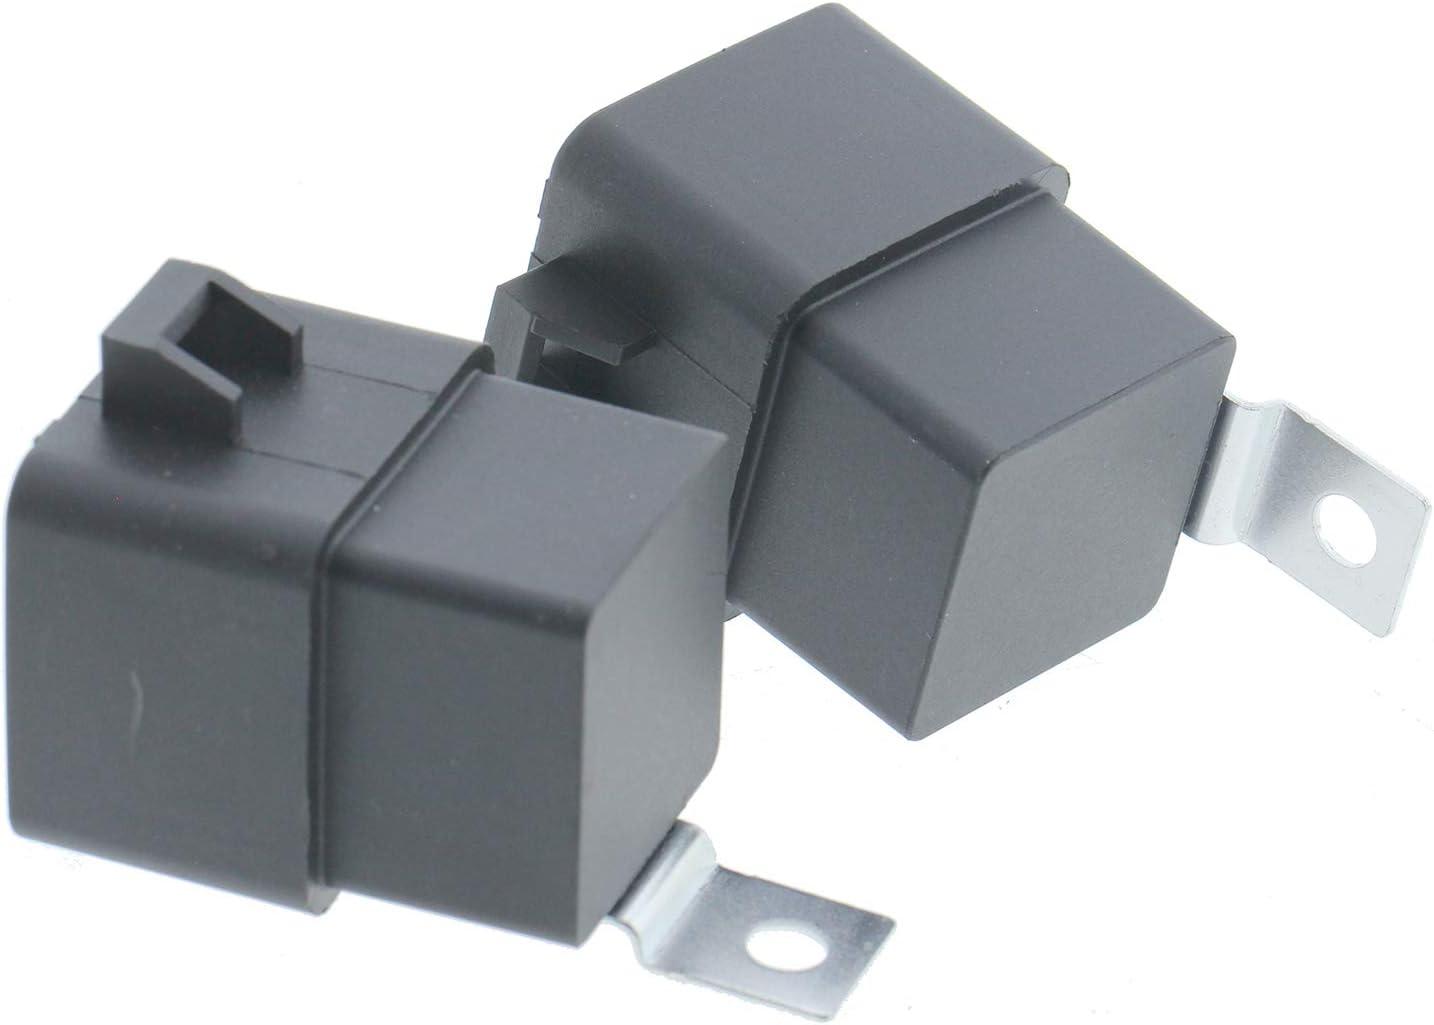 Solarhome 2PK Equipment Relay #AM123716 for John Deere